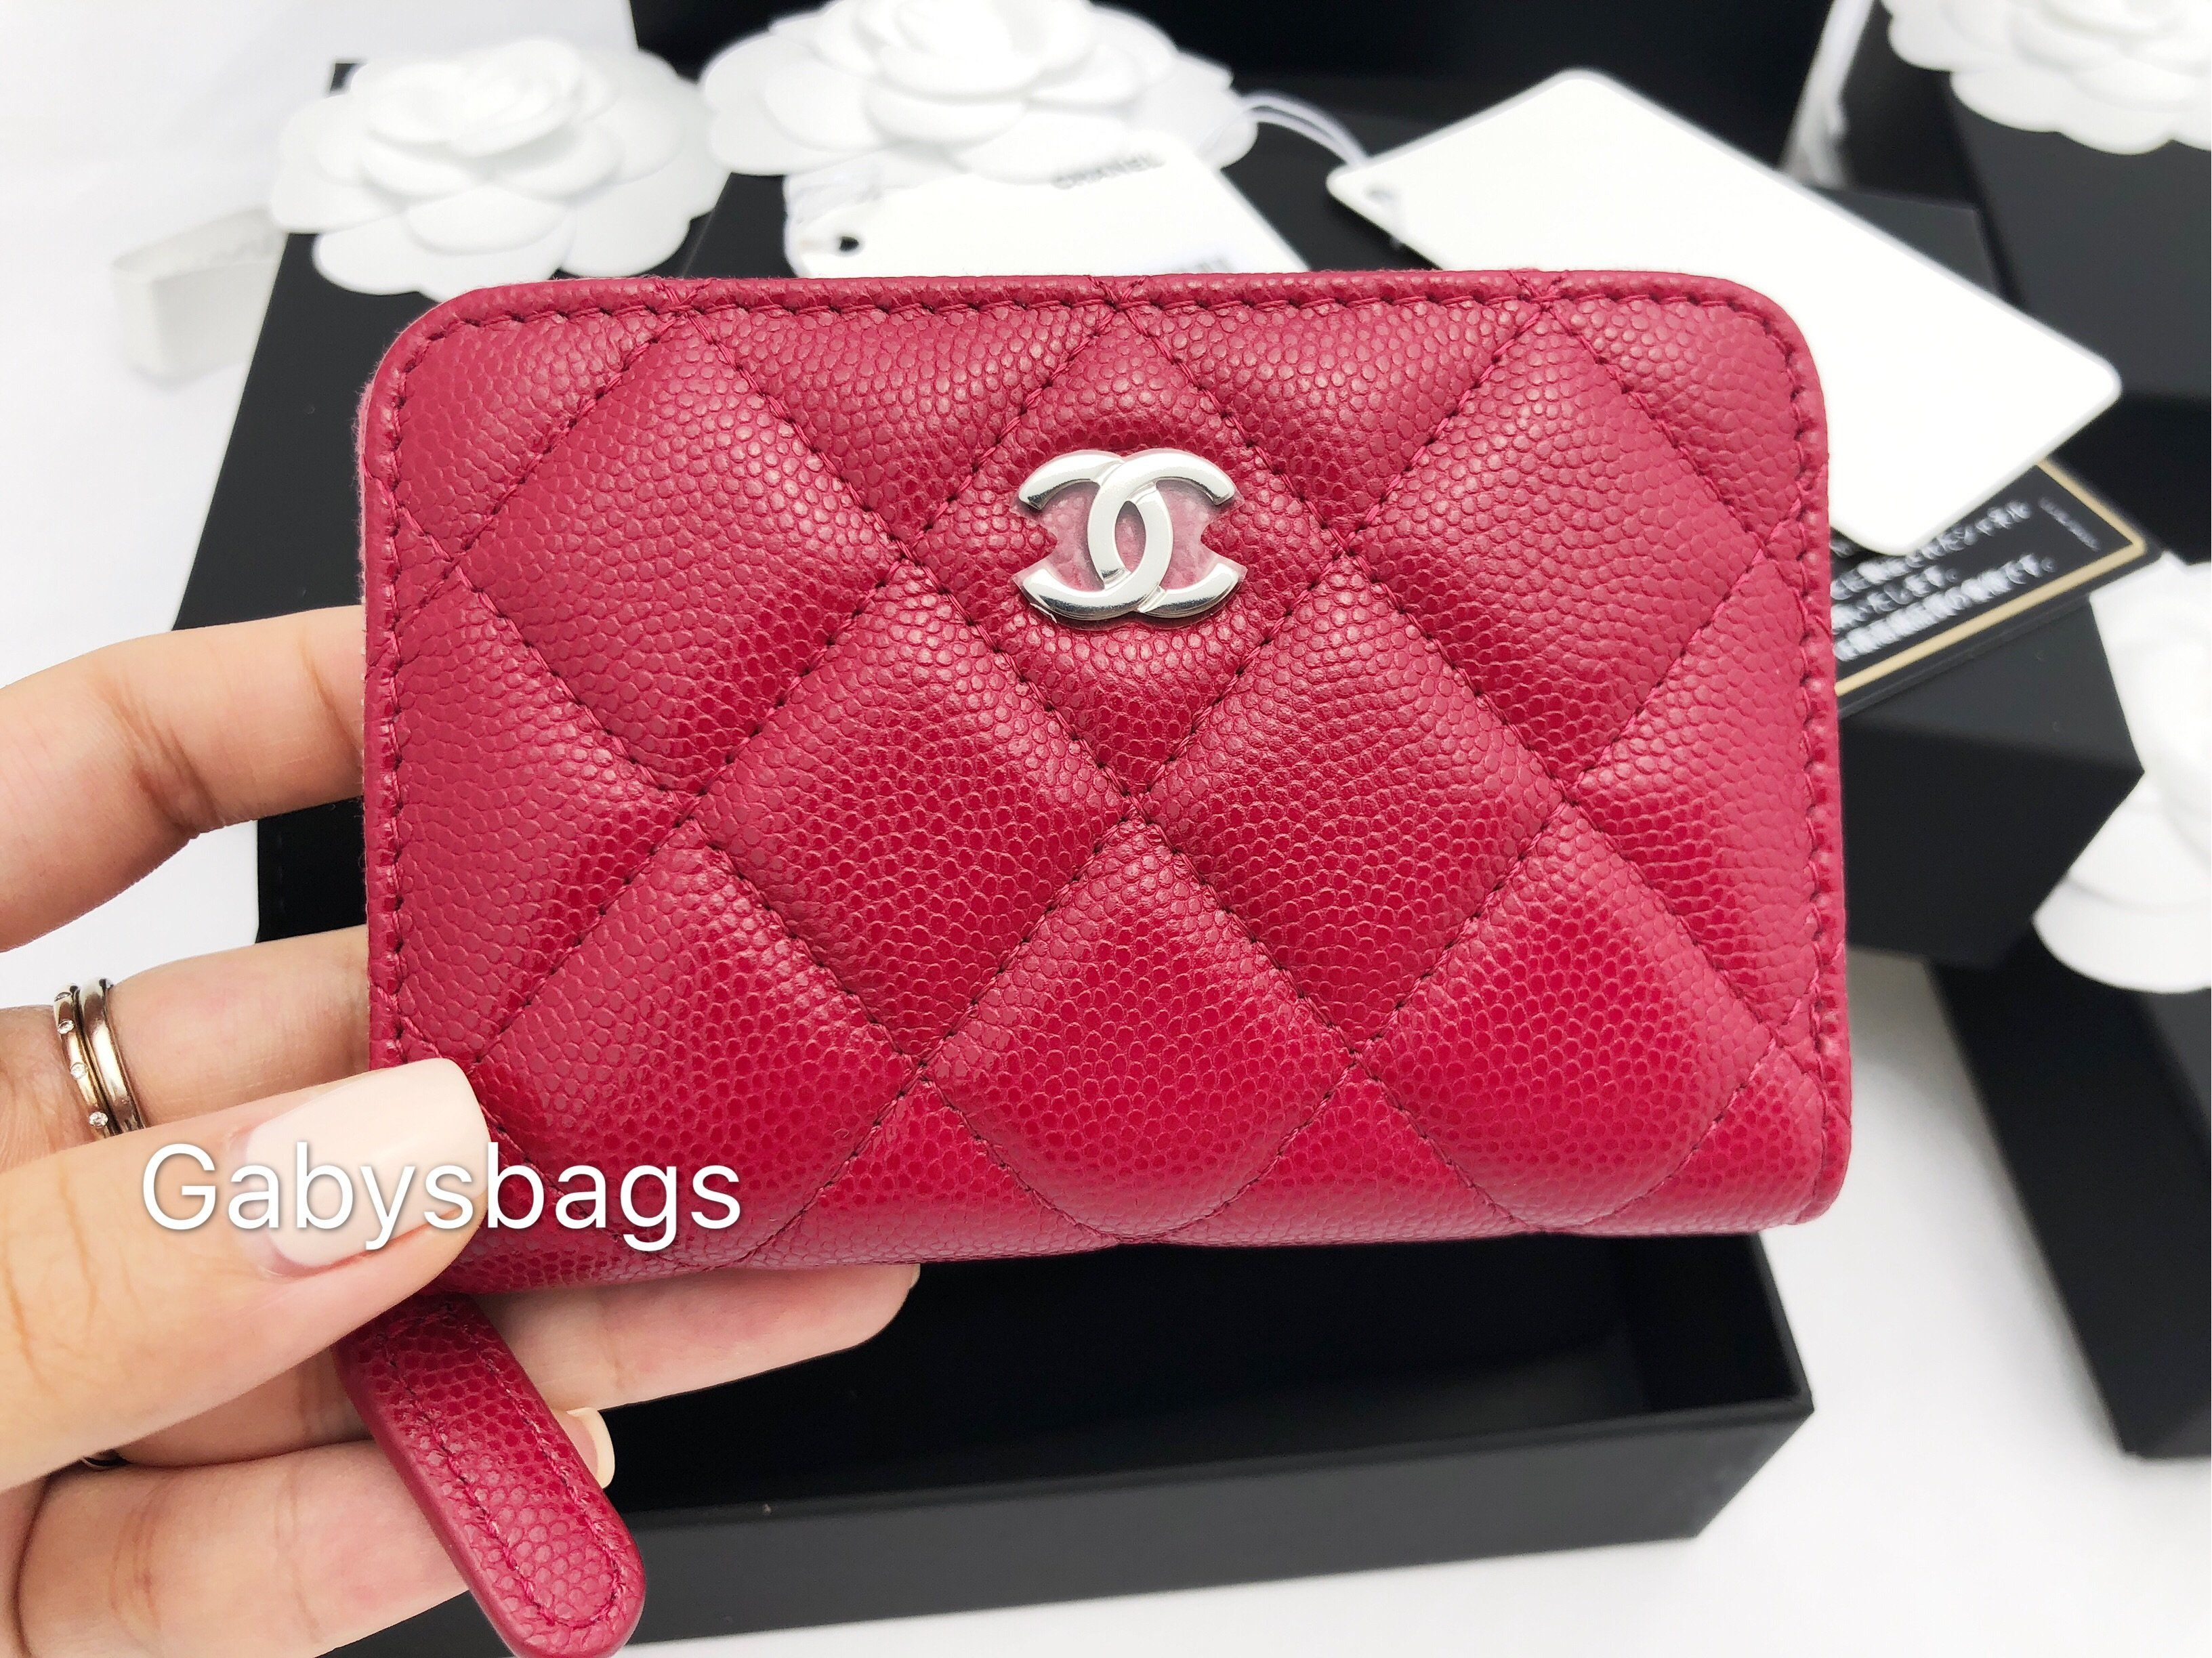 5b86687fb08b CHANEL Caviar O Coin Card Holder Zip Wallet 18B Dark Pink Red #GabysBags # Handbags